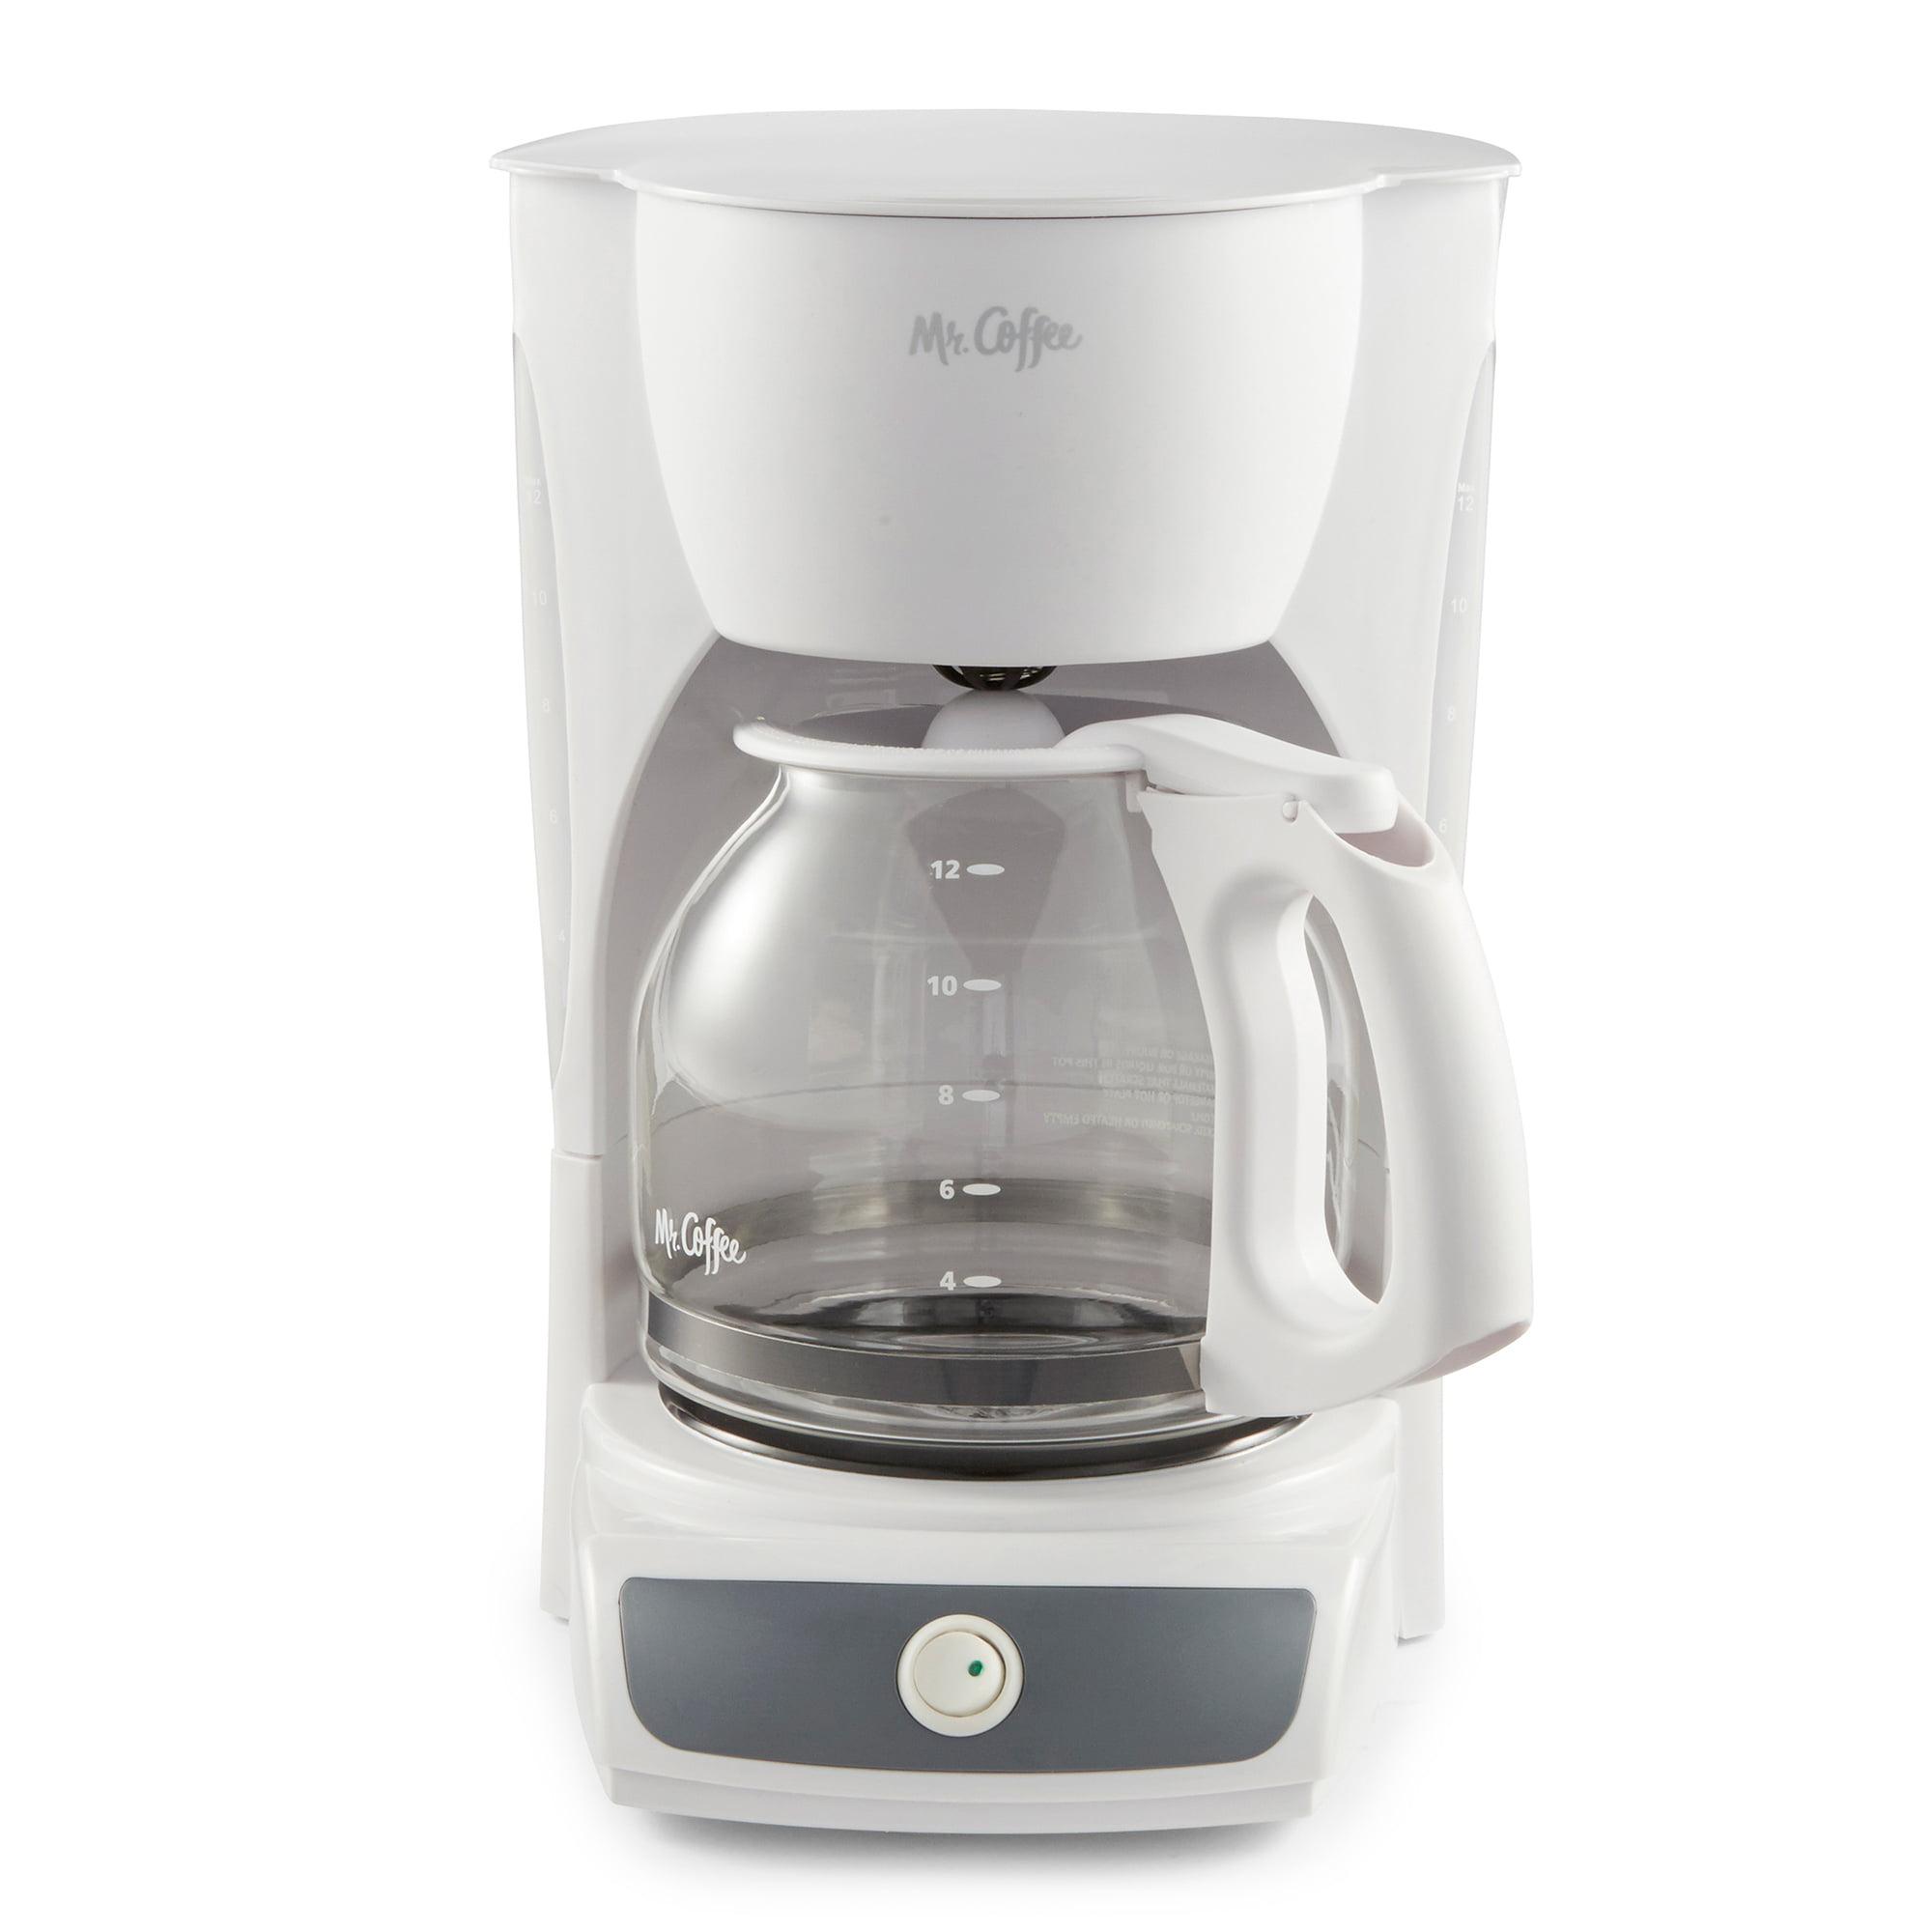 Mr. Coffee 12-Cup Switch Coffee Maker, White (CG12) - Walmart.com